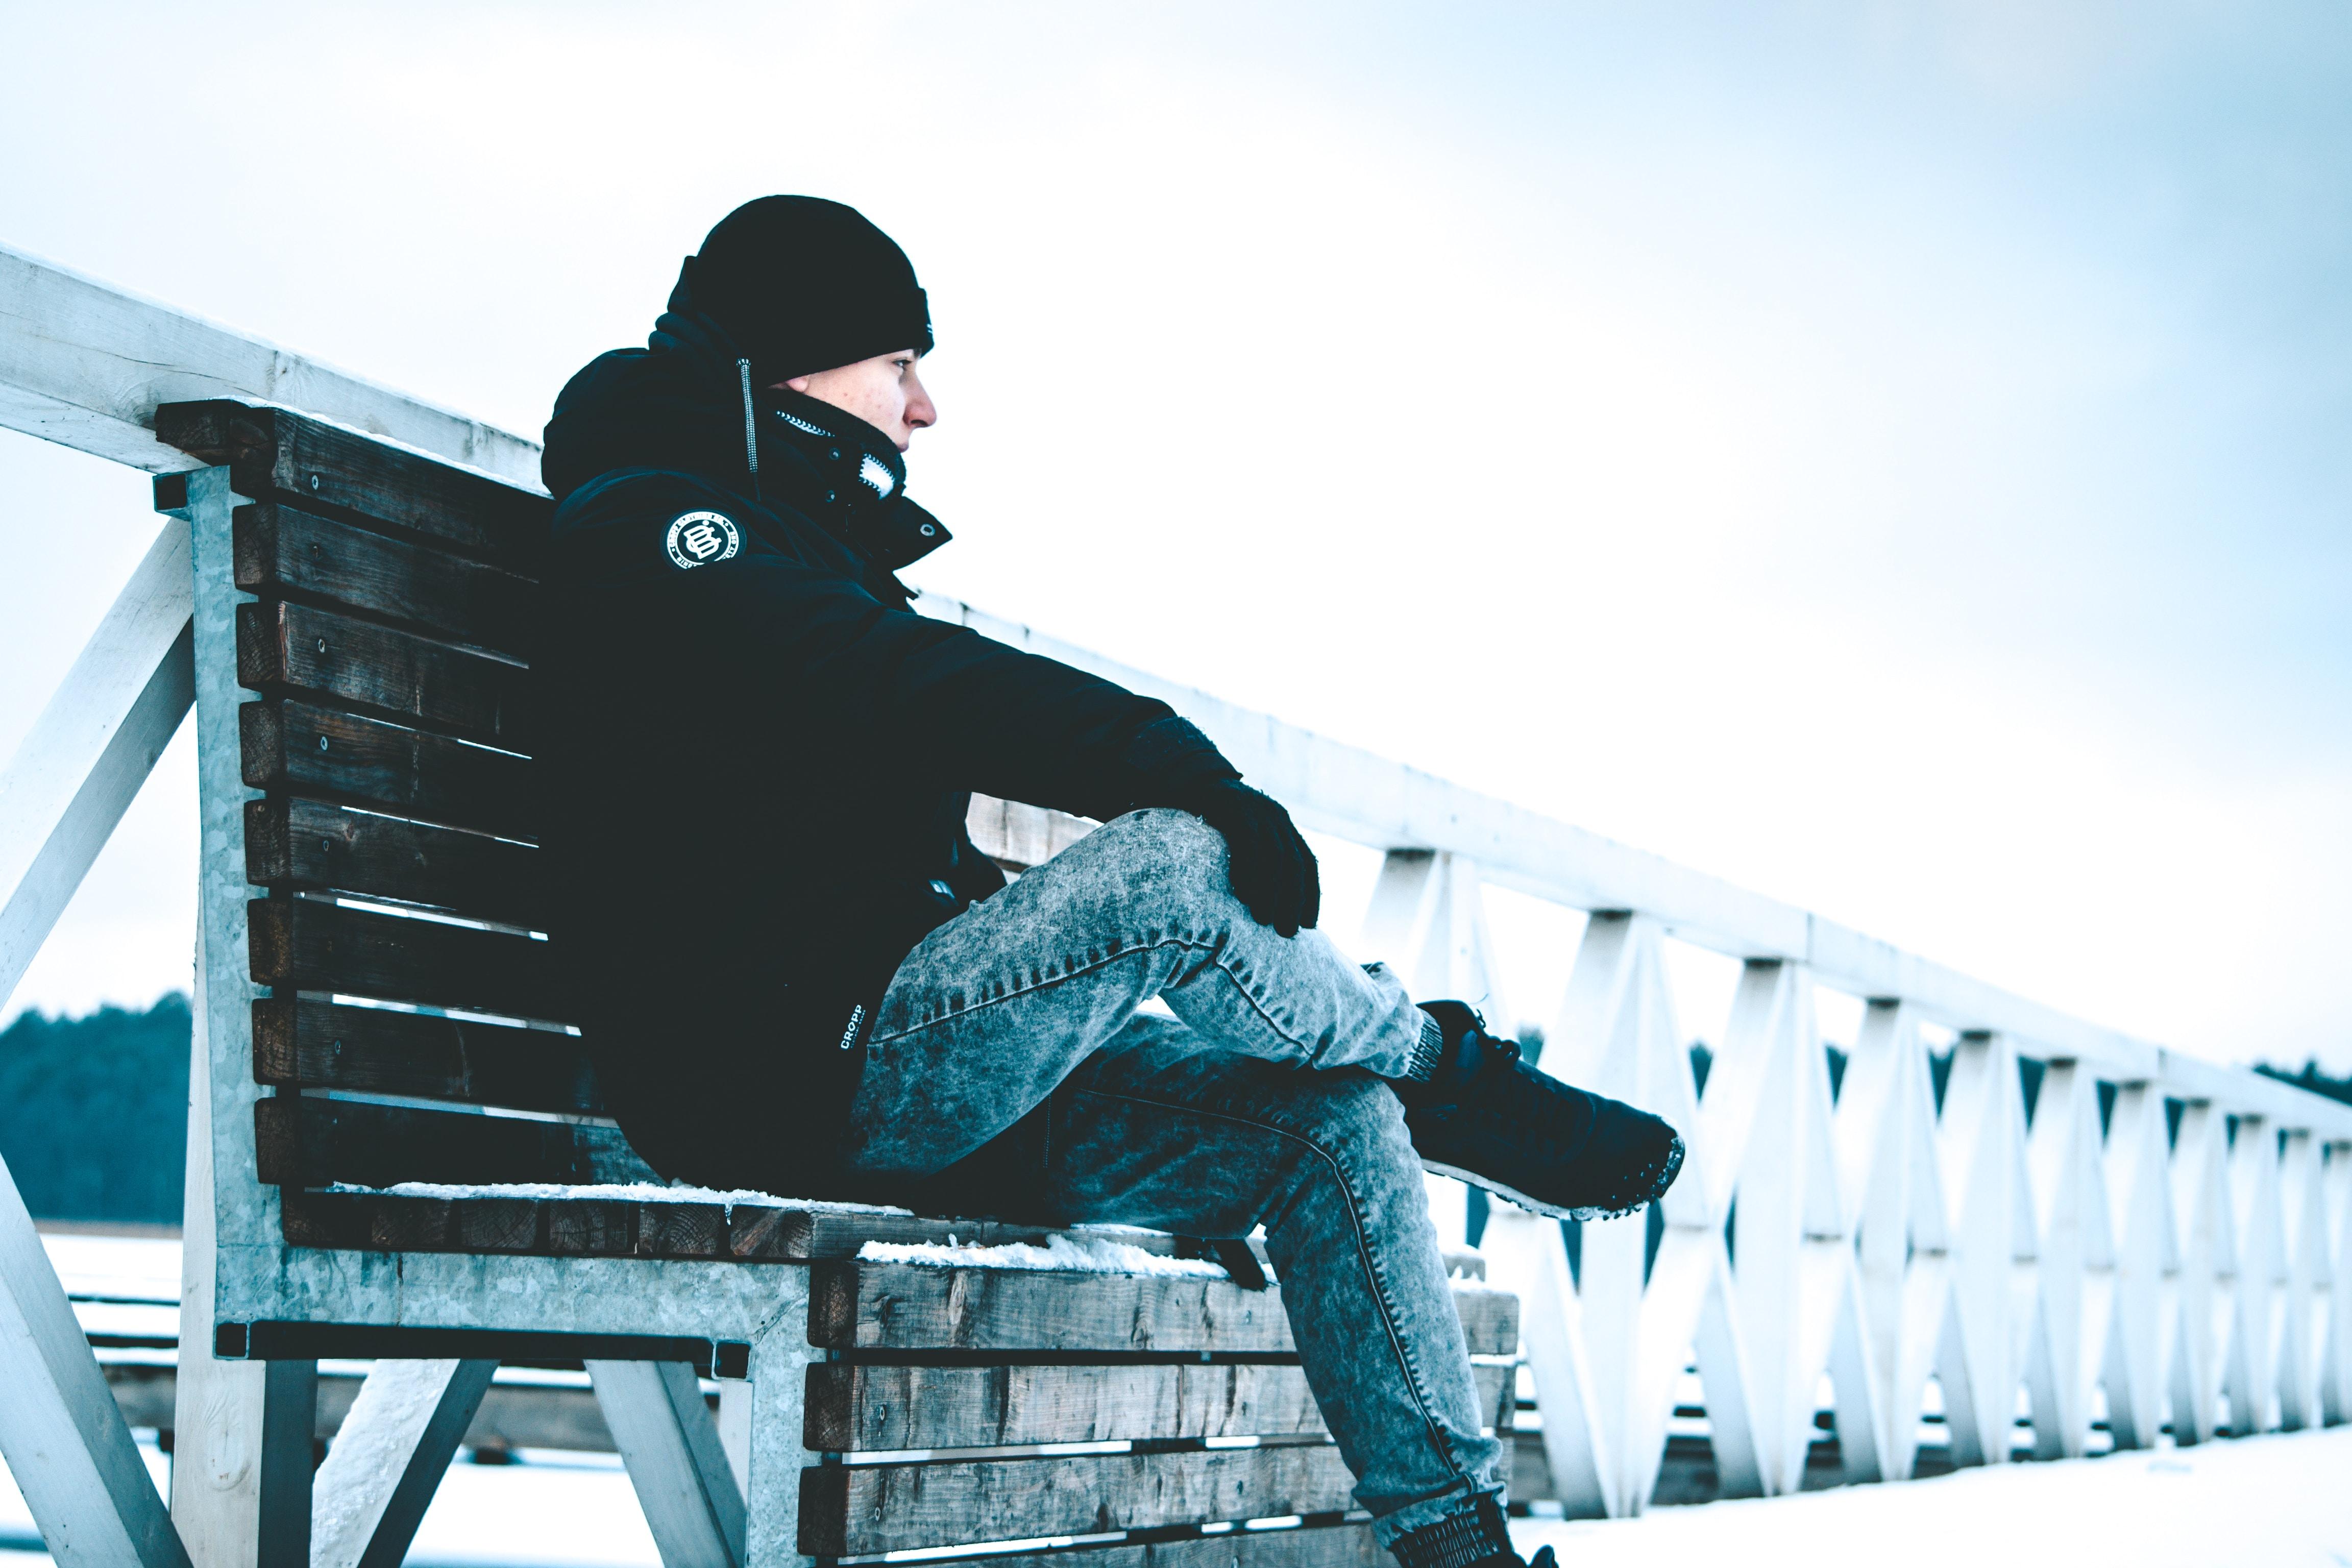 man in black jacket sits on bench beside white railing